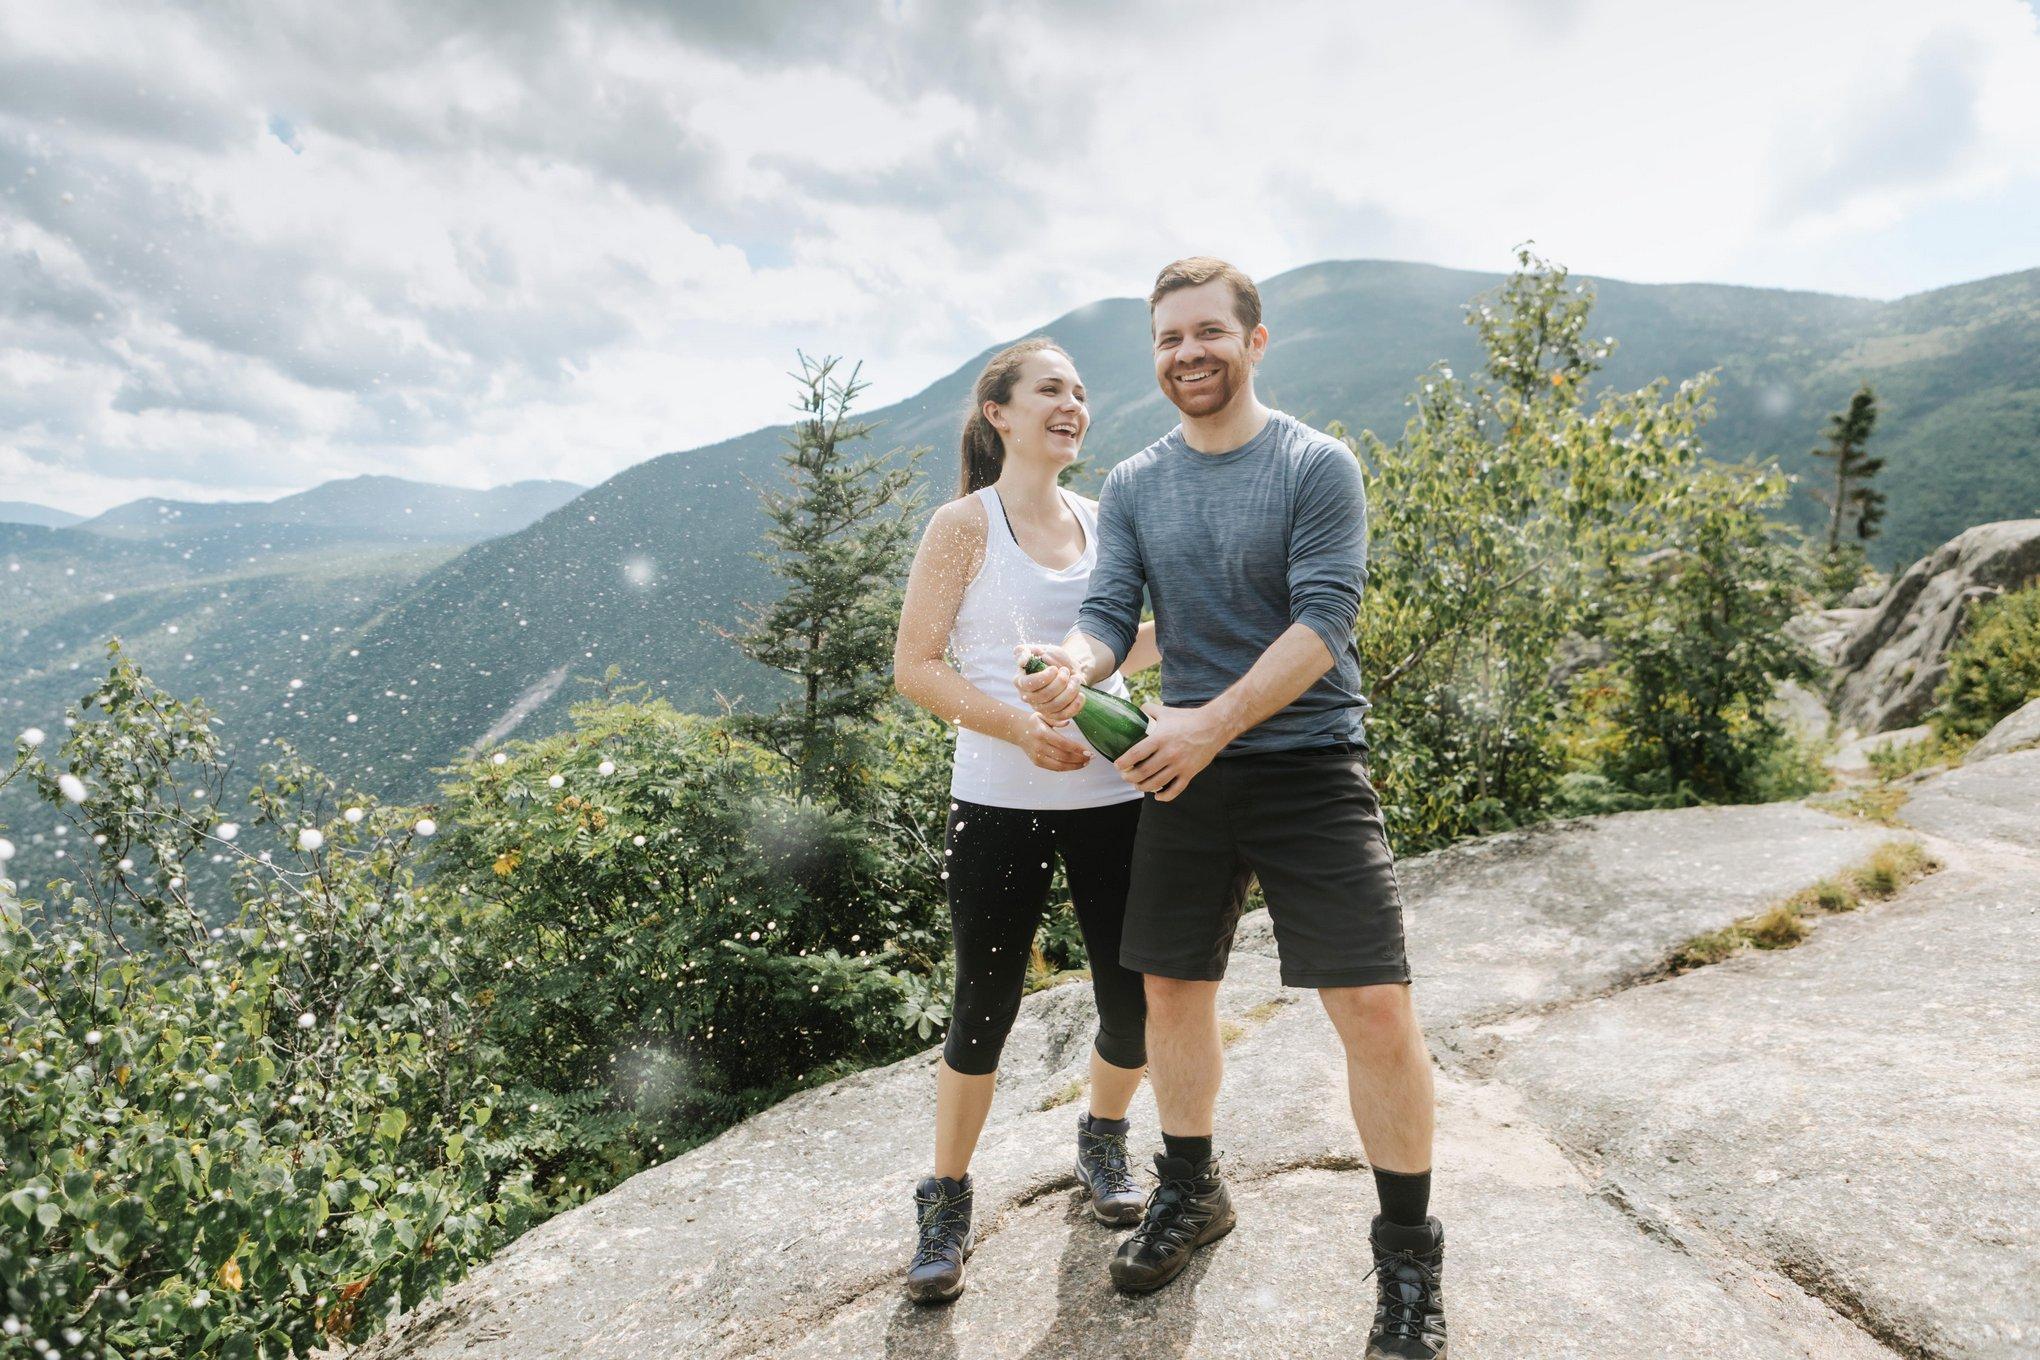 Mount-Willard-White-Mountains-Engagement-Elopement-Lena-Mirisola-21.JPG